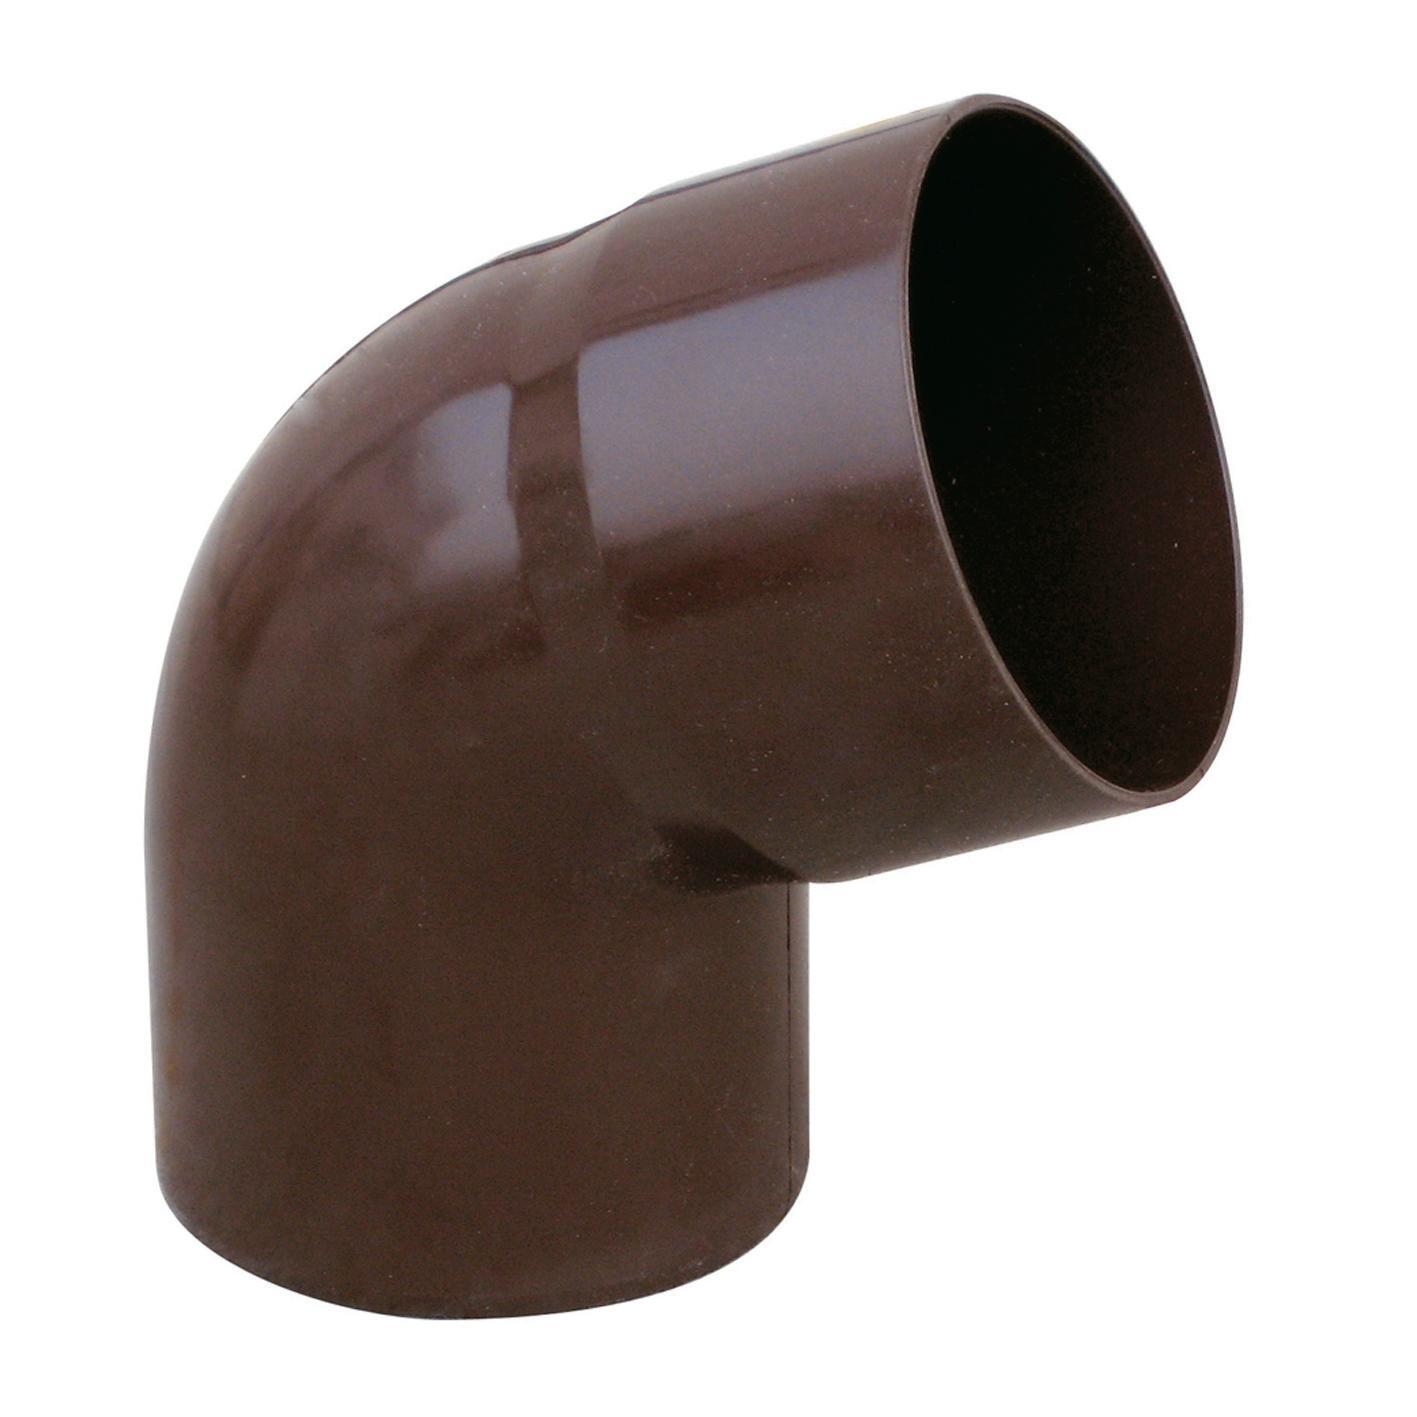 Curva pluviale in plastica Ø 63 mm